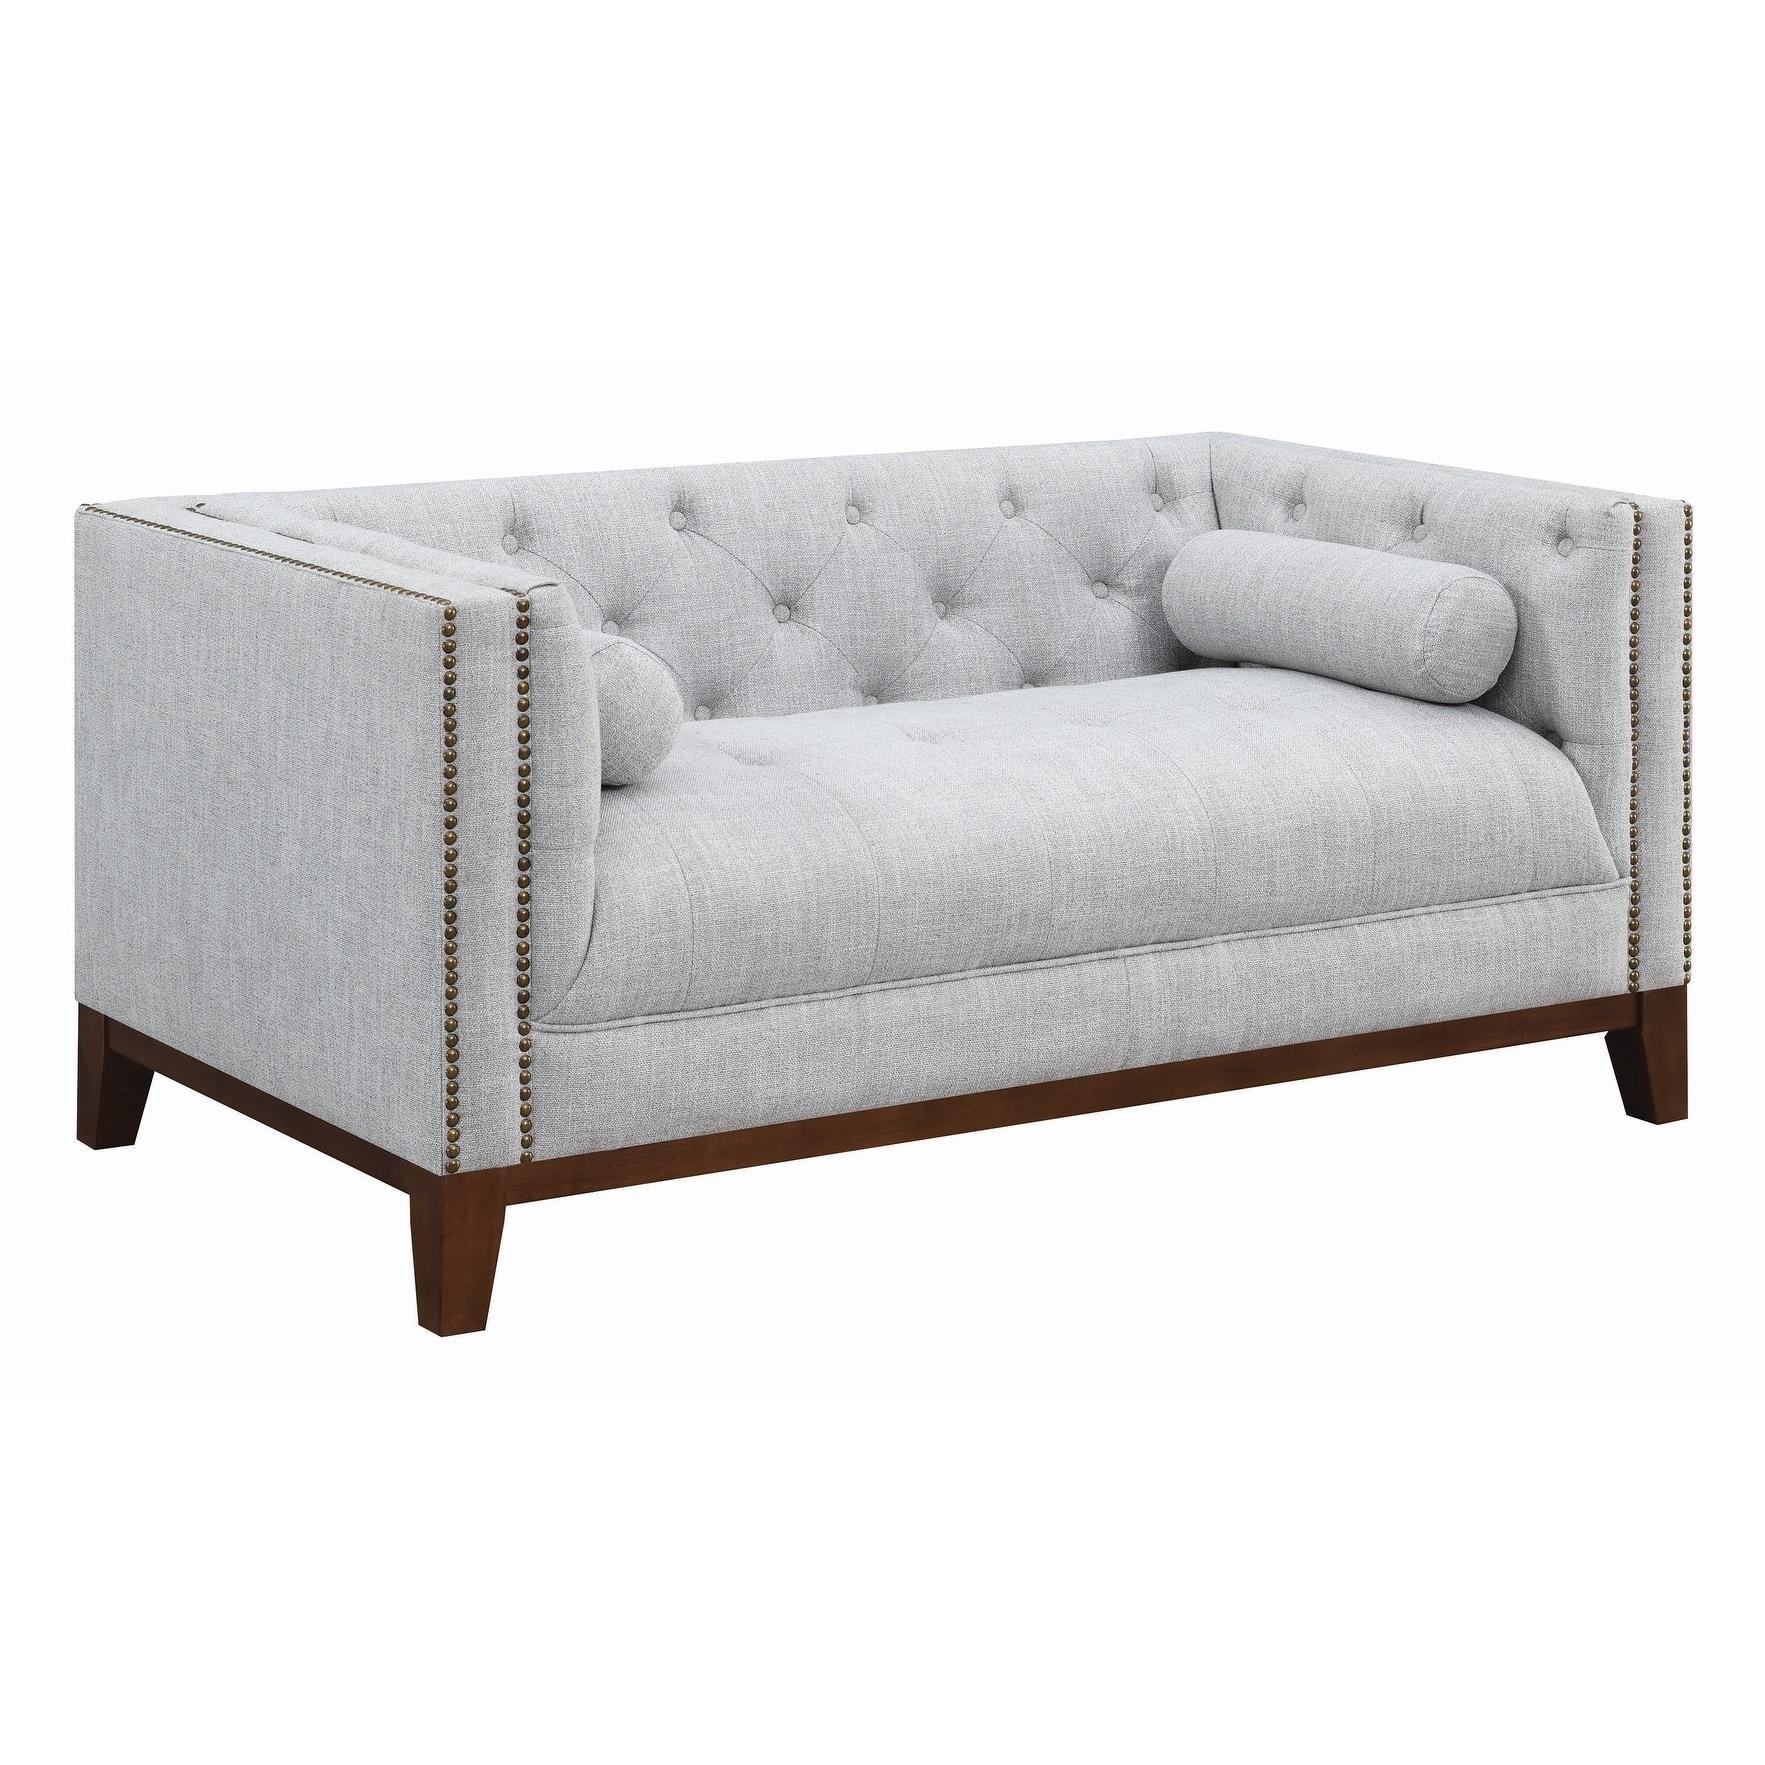 Light Grey Upholstered Tufted